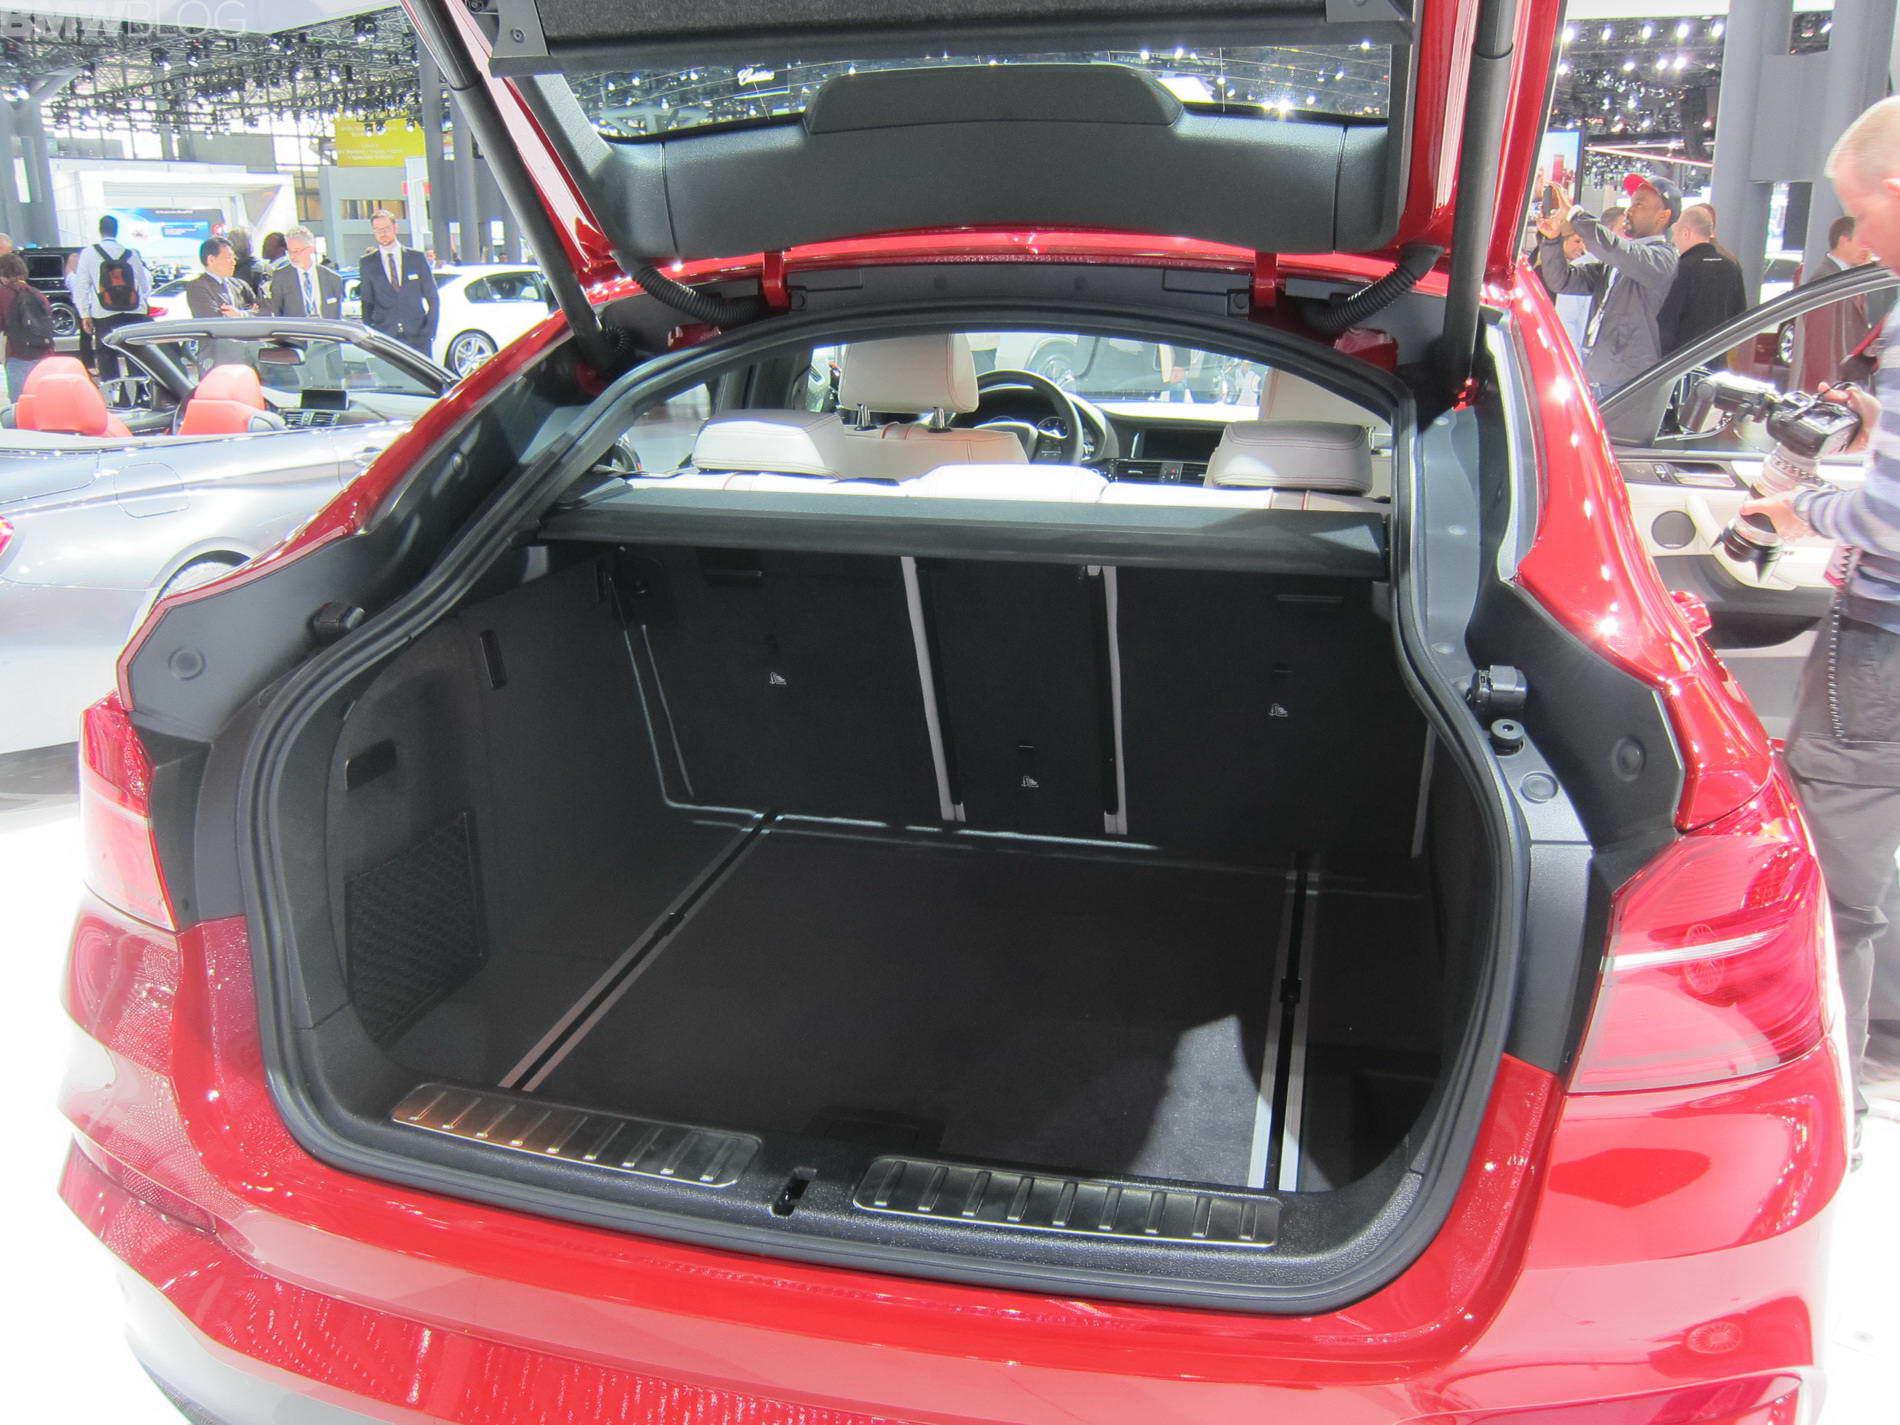 BMW X4 2014 World premiere